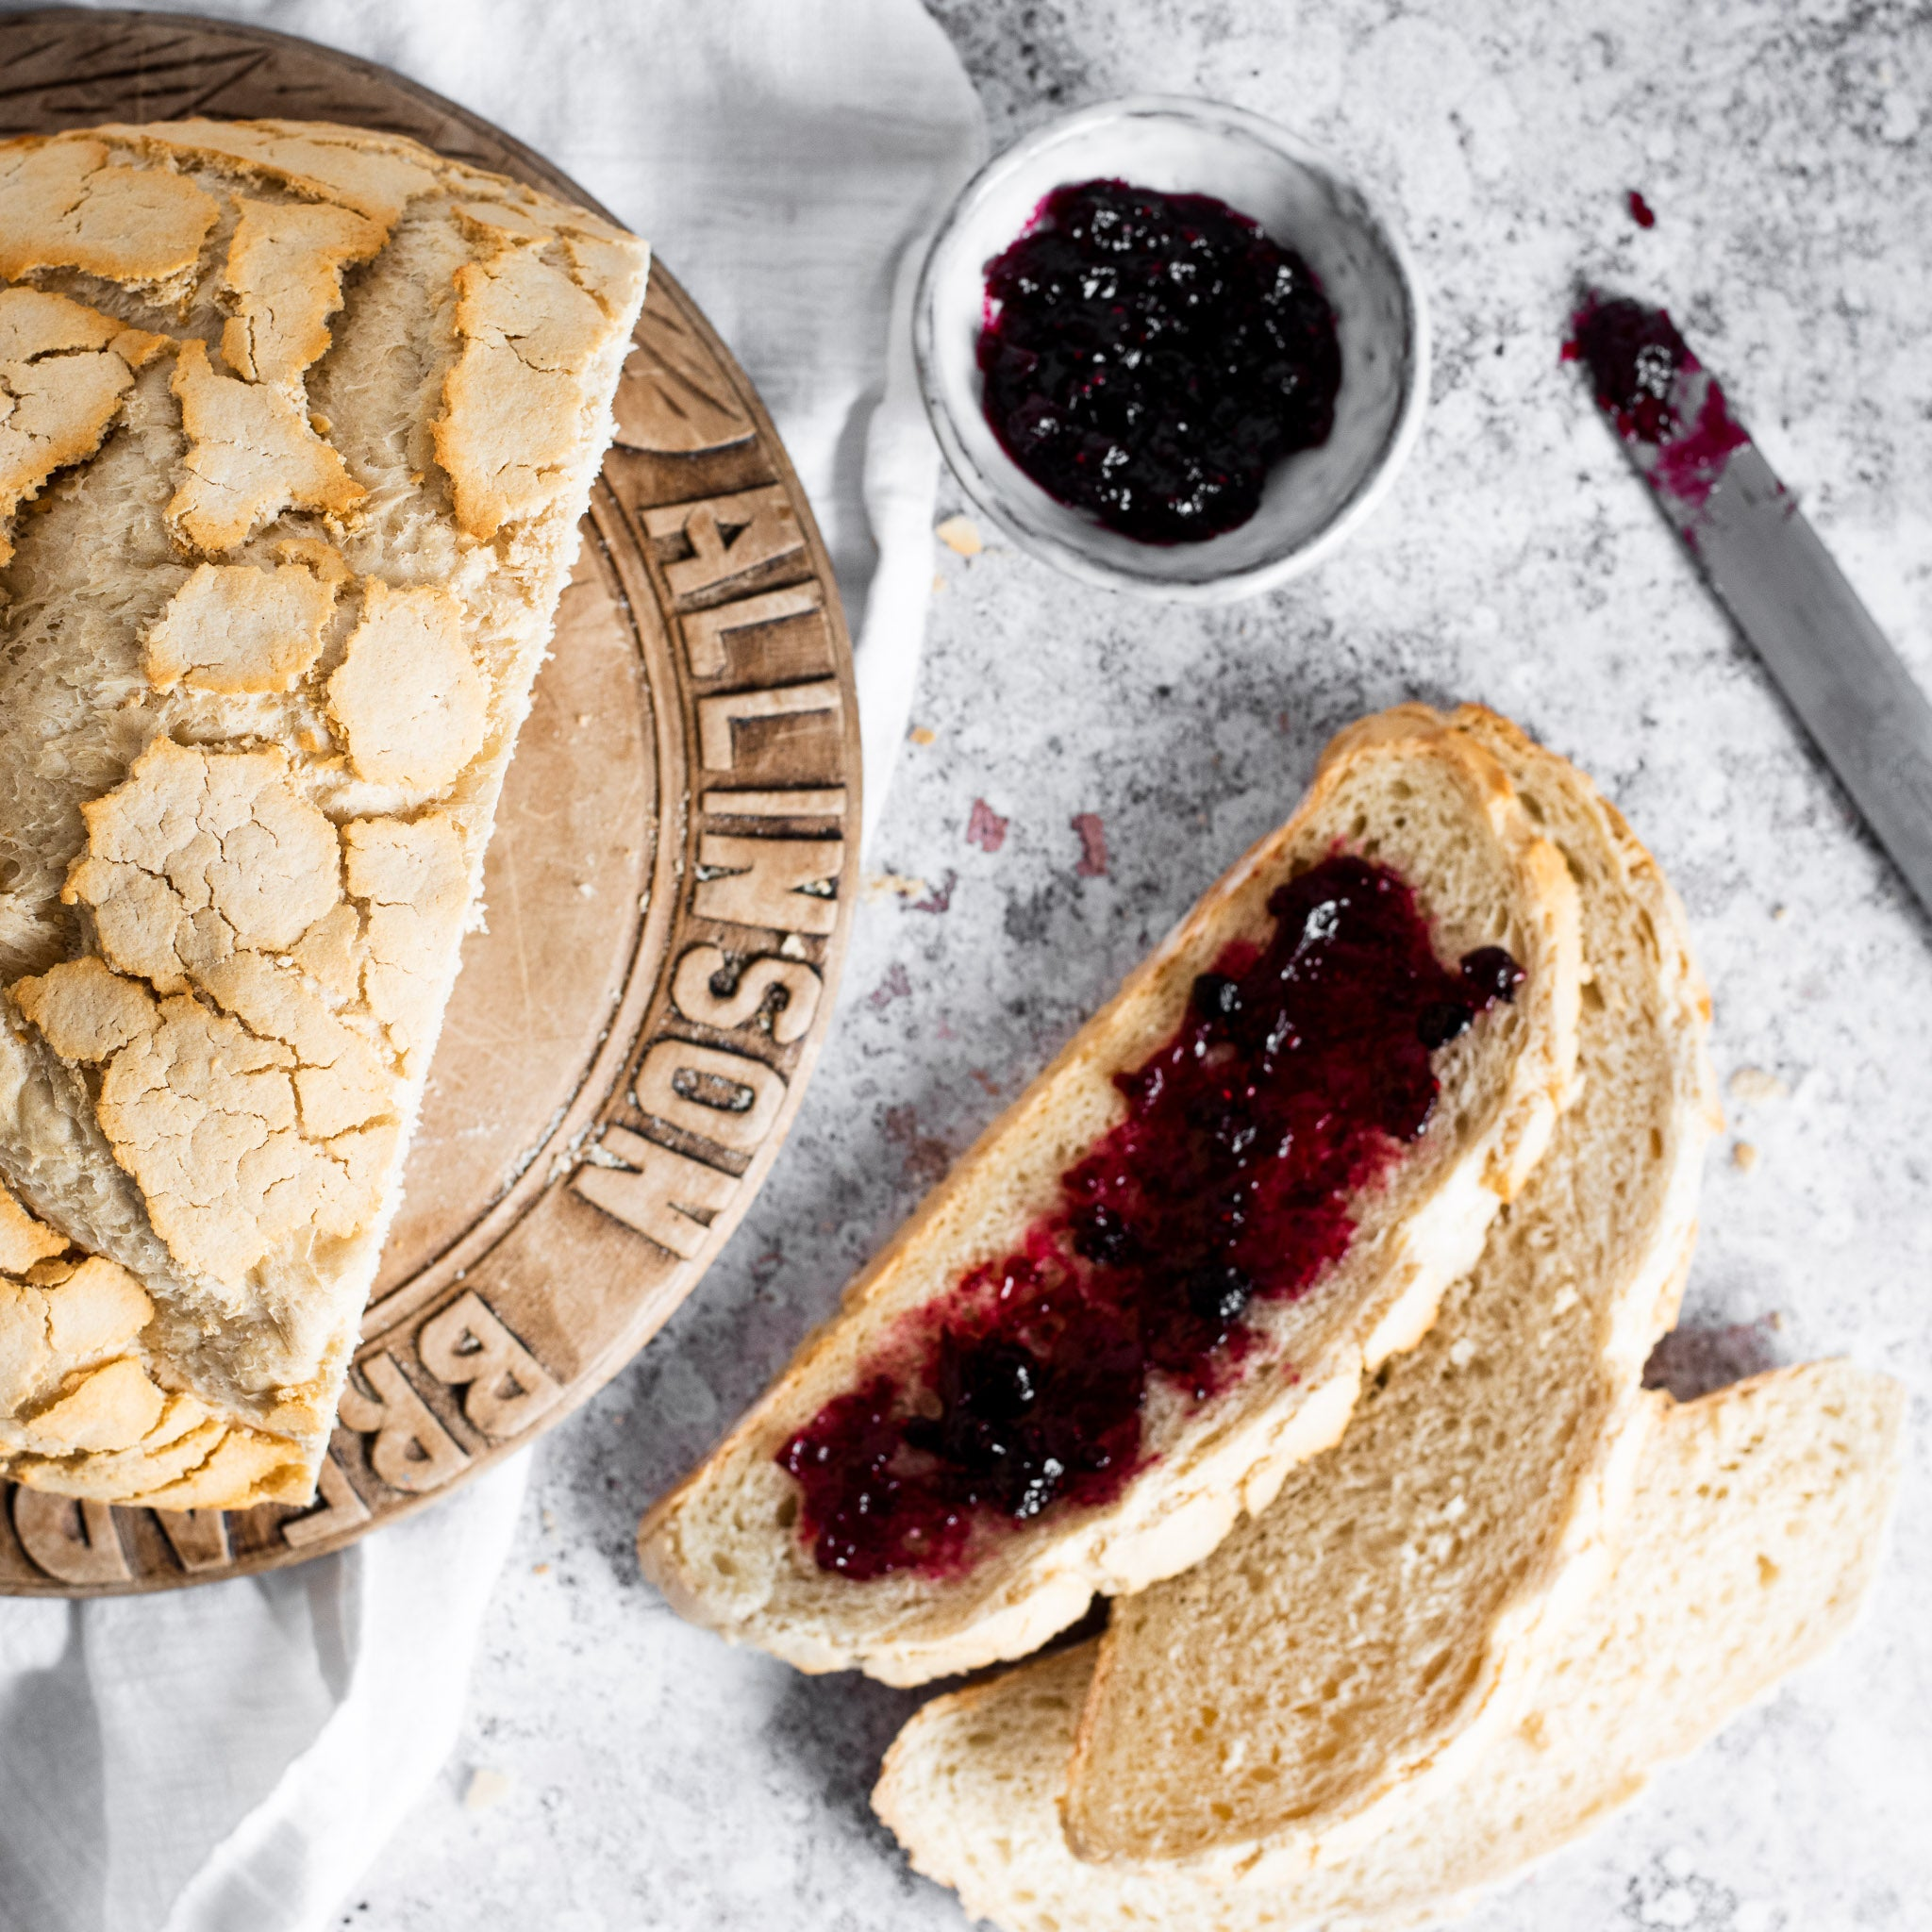 Tiger-Bread-by-Allinson-s-(4).jpg